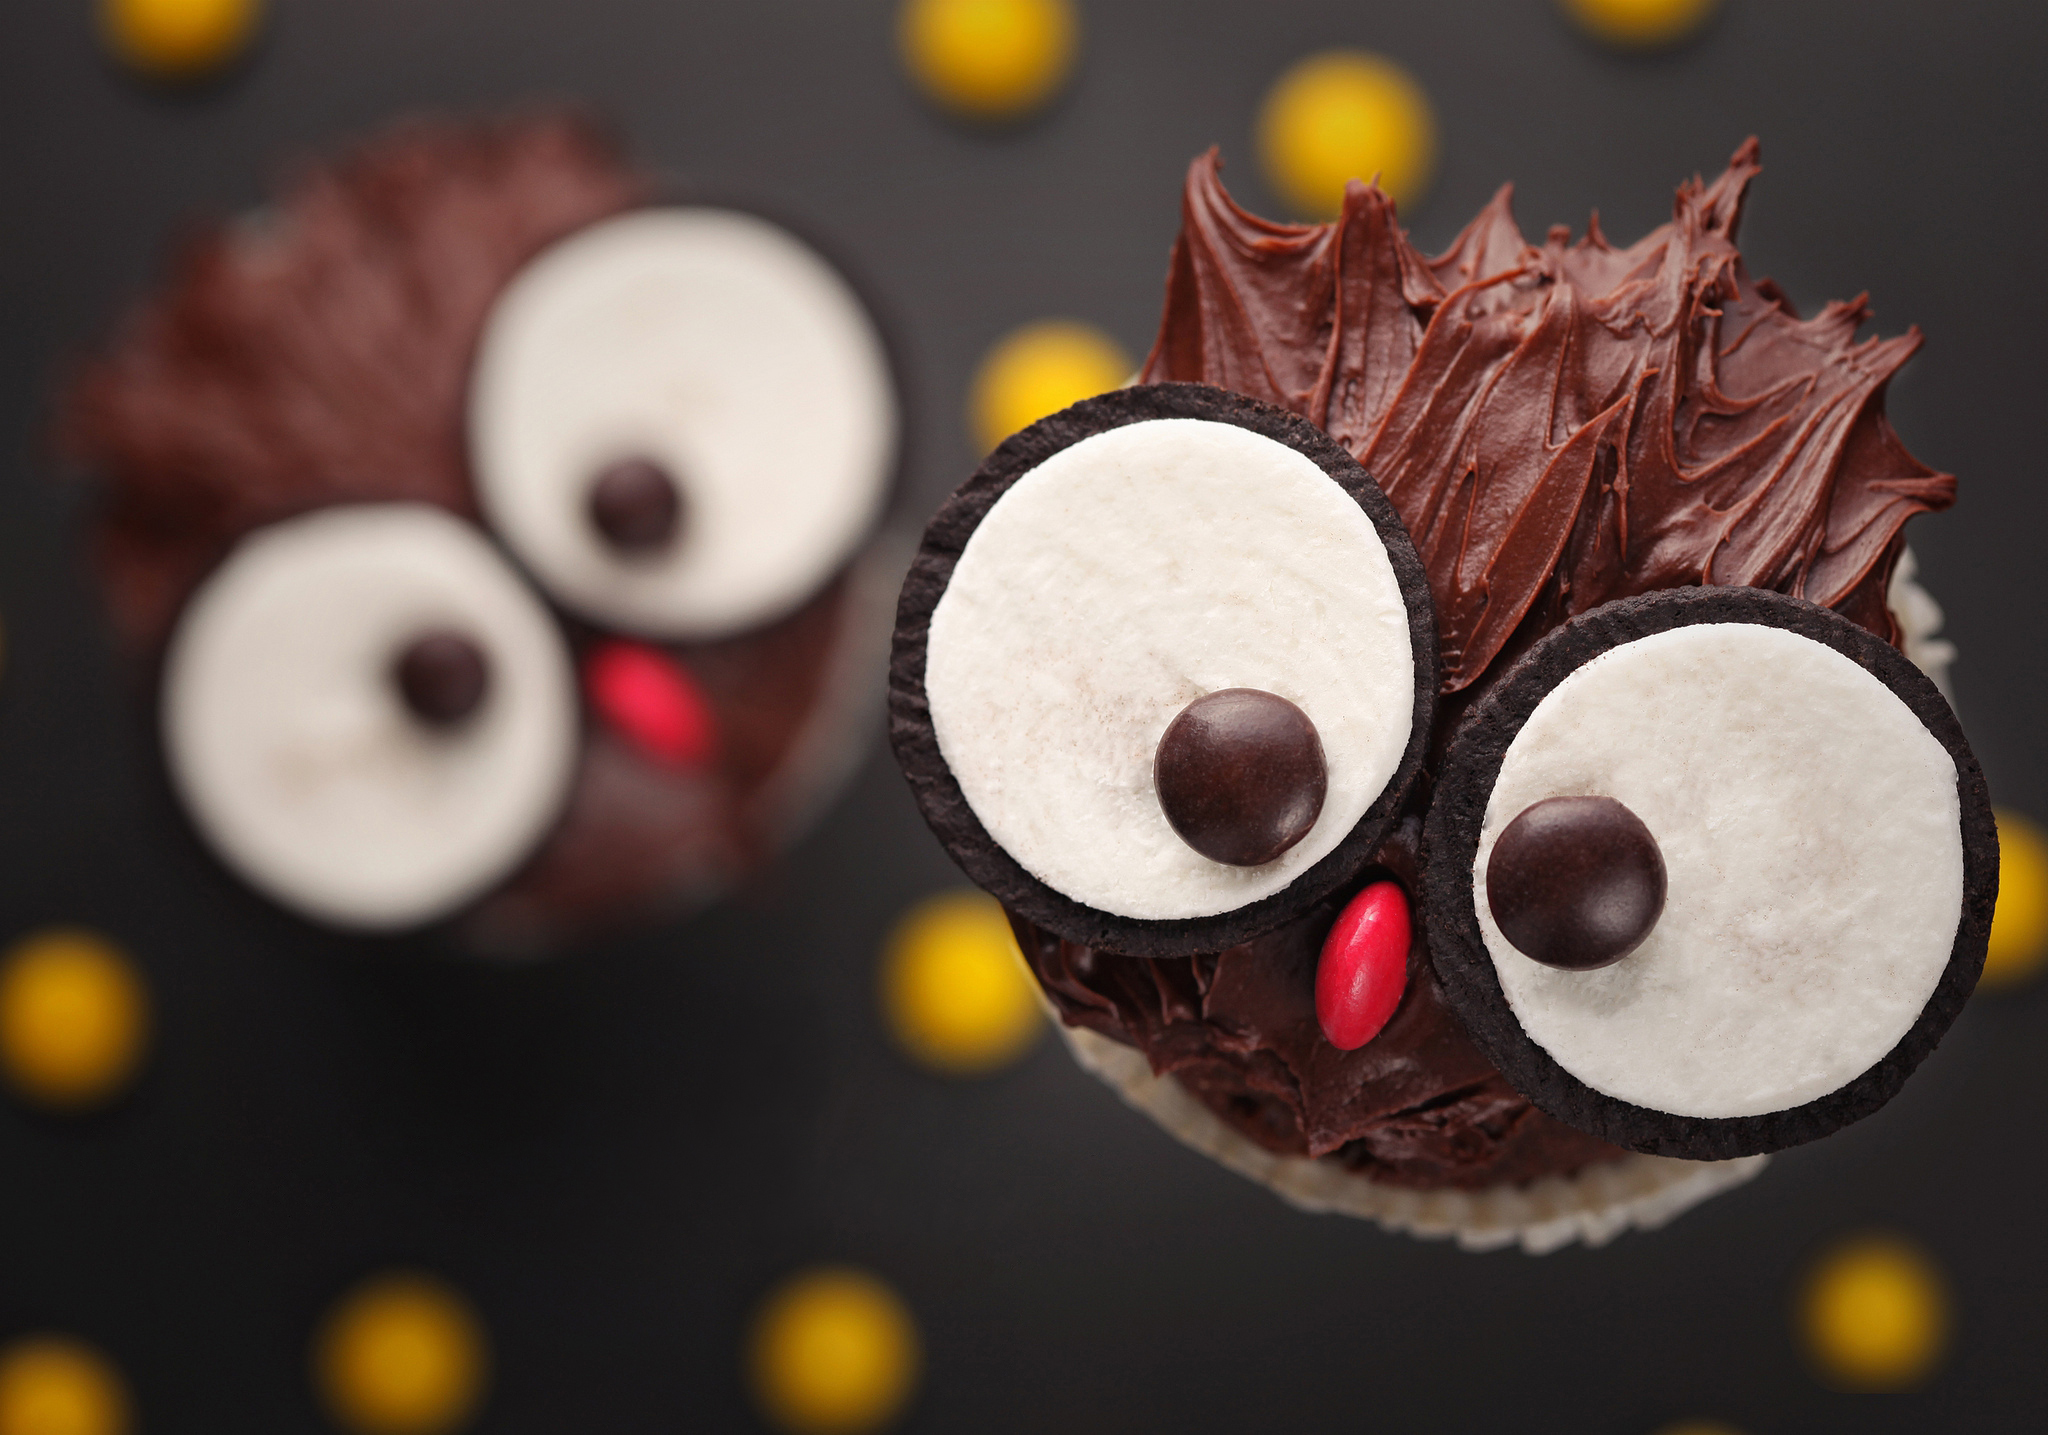 Fondos De Pantalla De Chocolates: Cupcake Fond D'écran HD